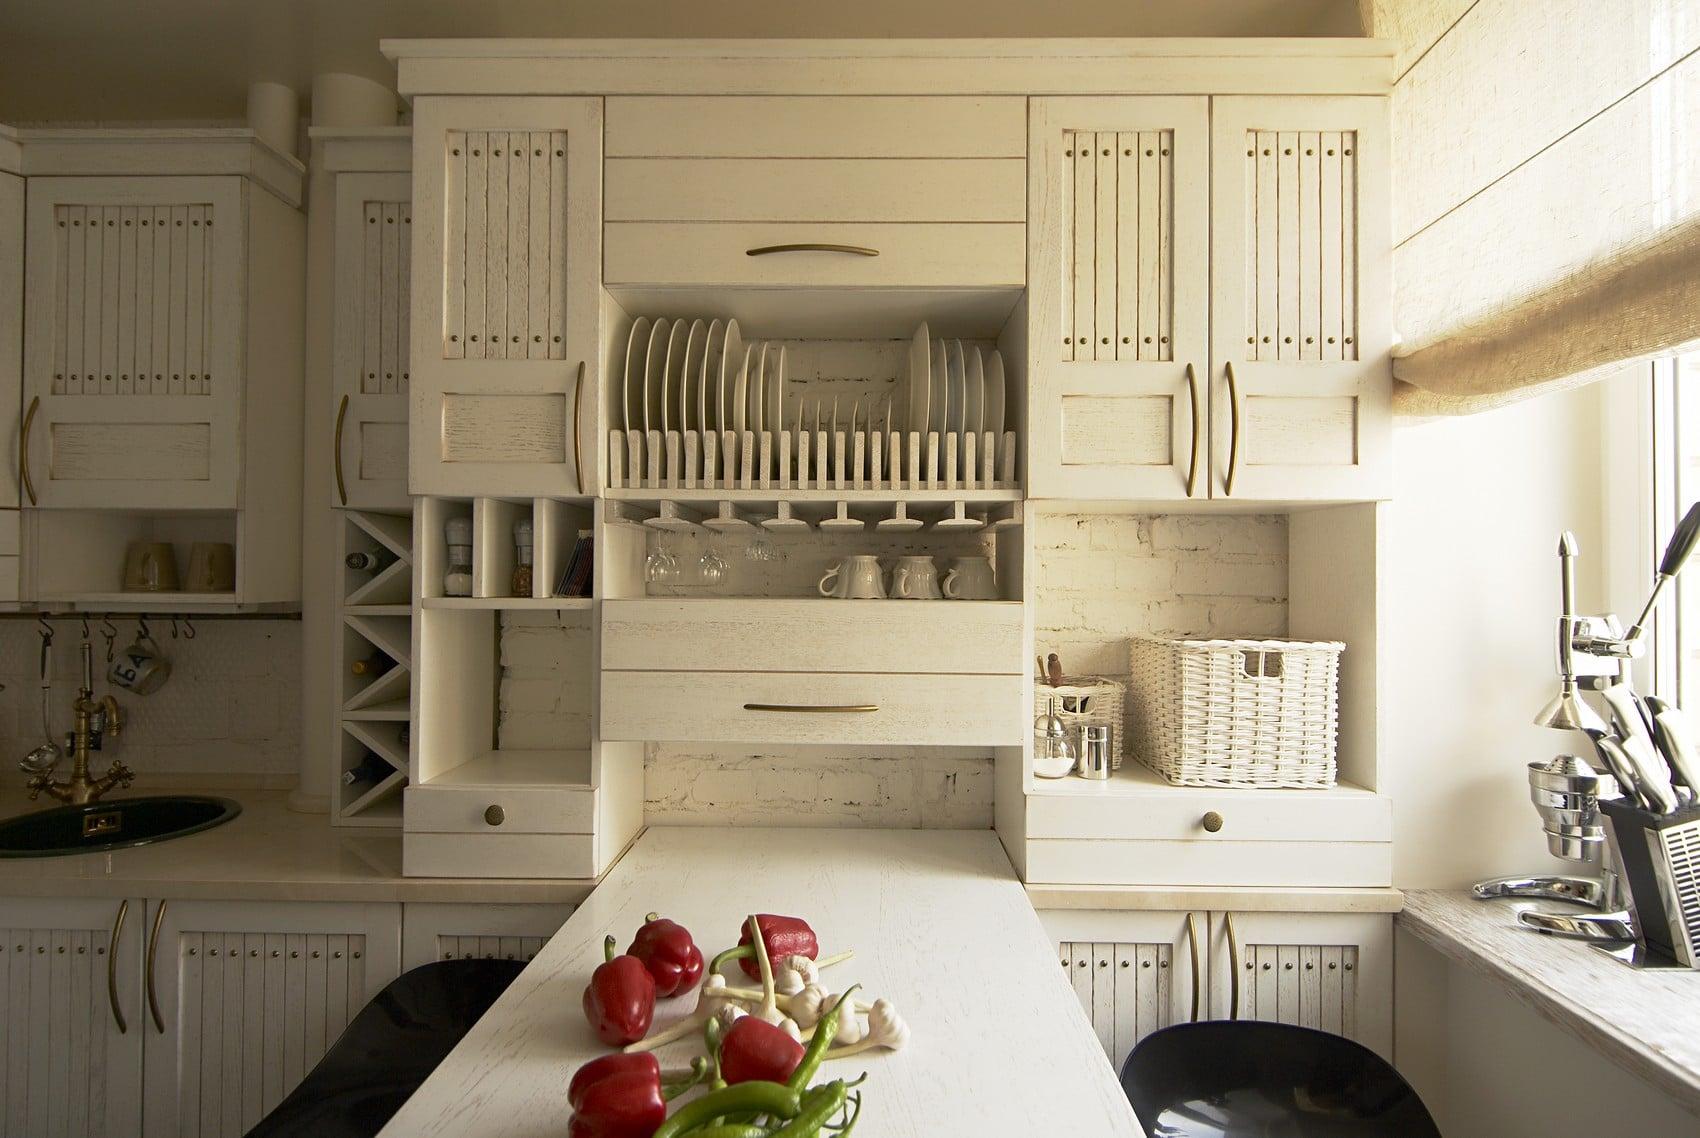 Кухня 6 кв м в стиле прованс